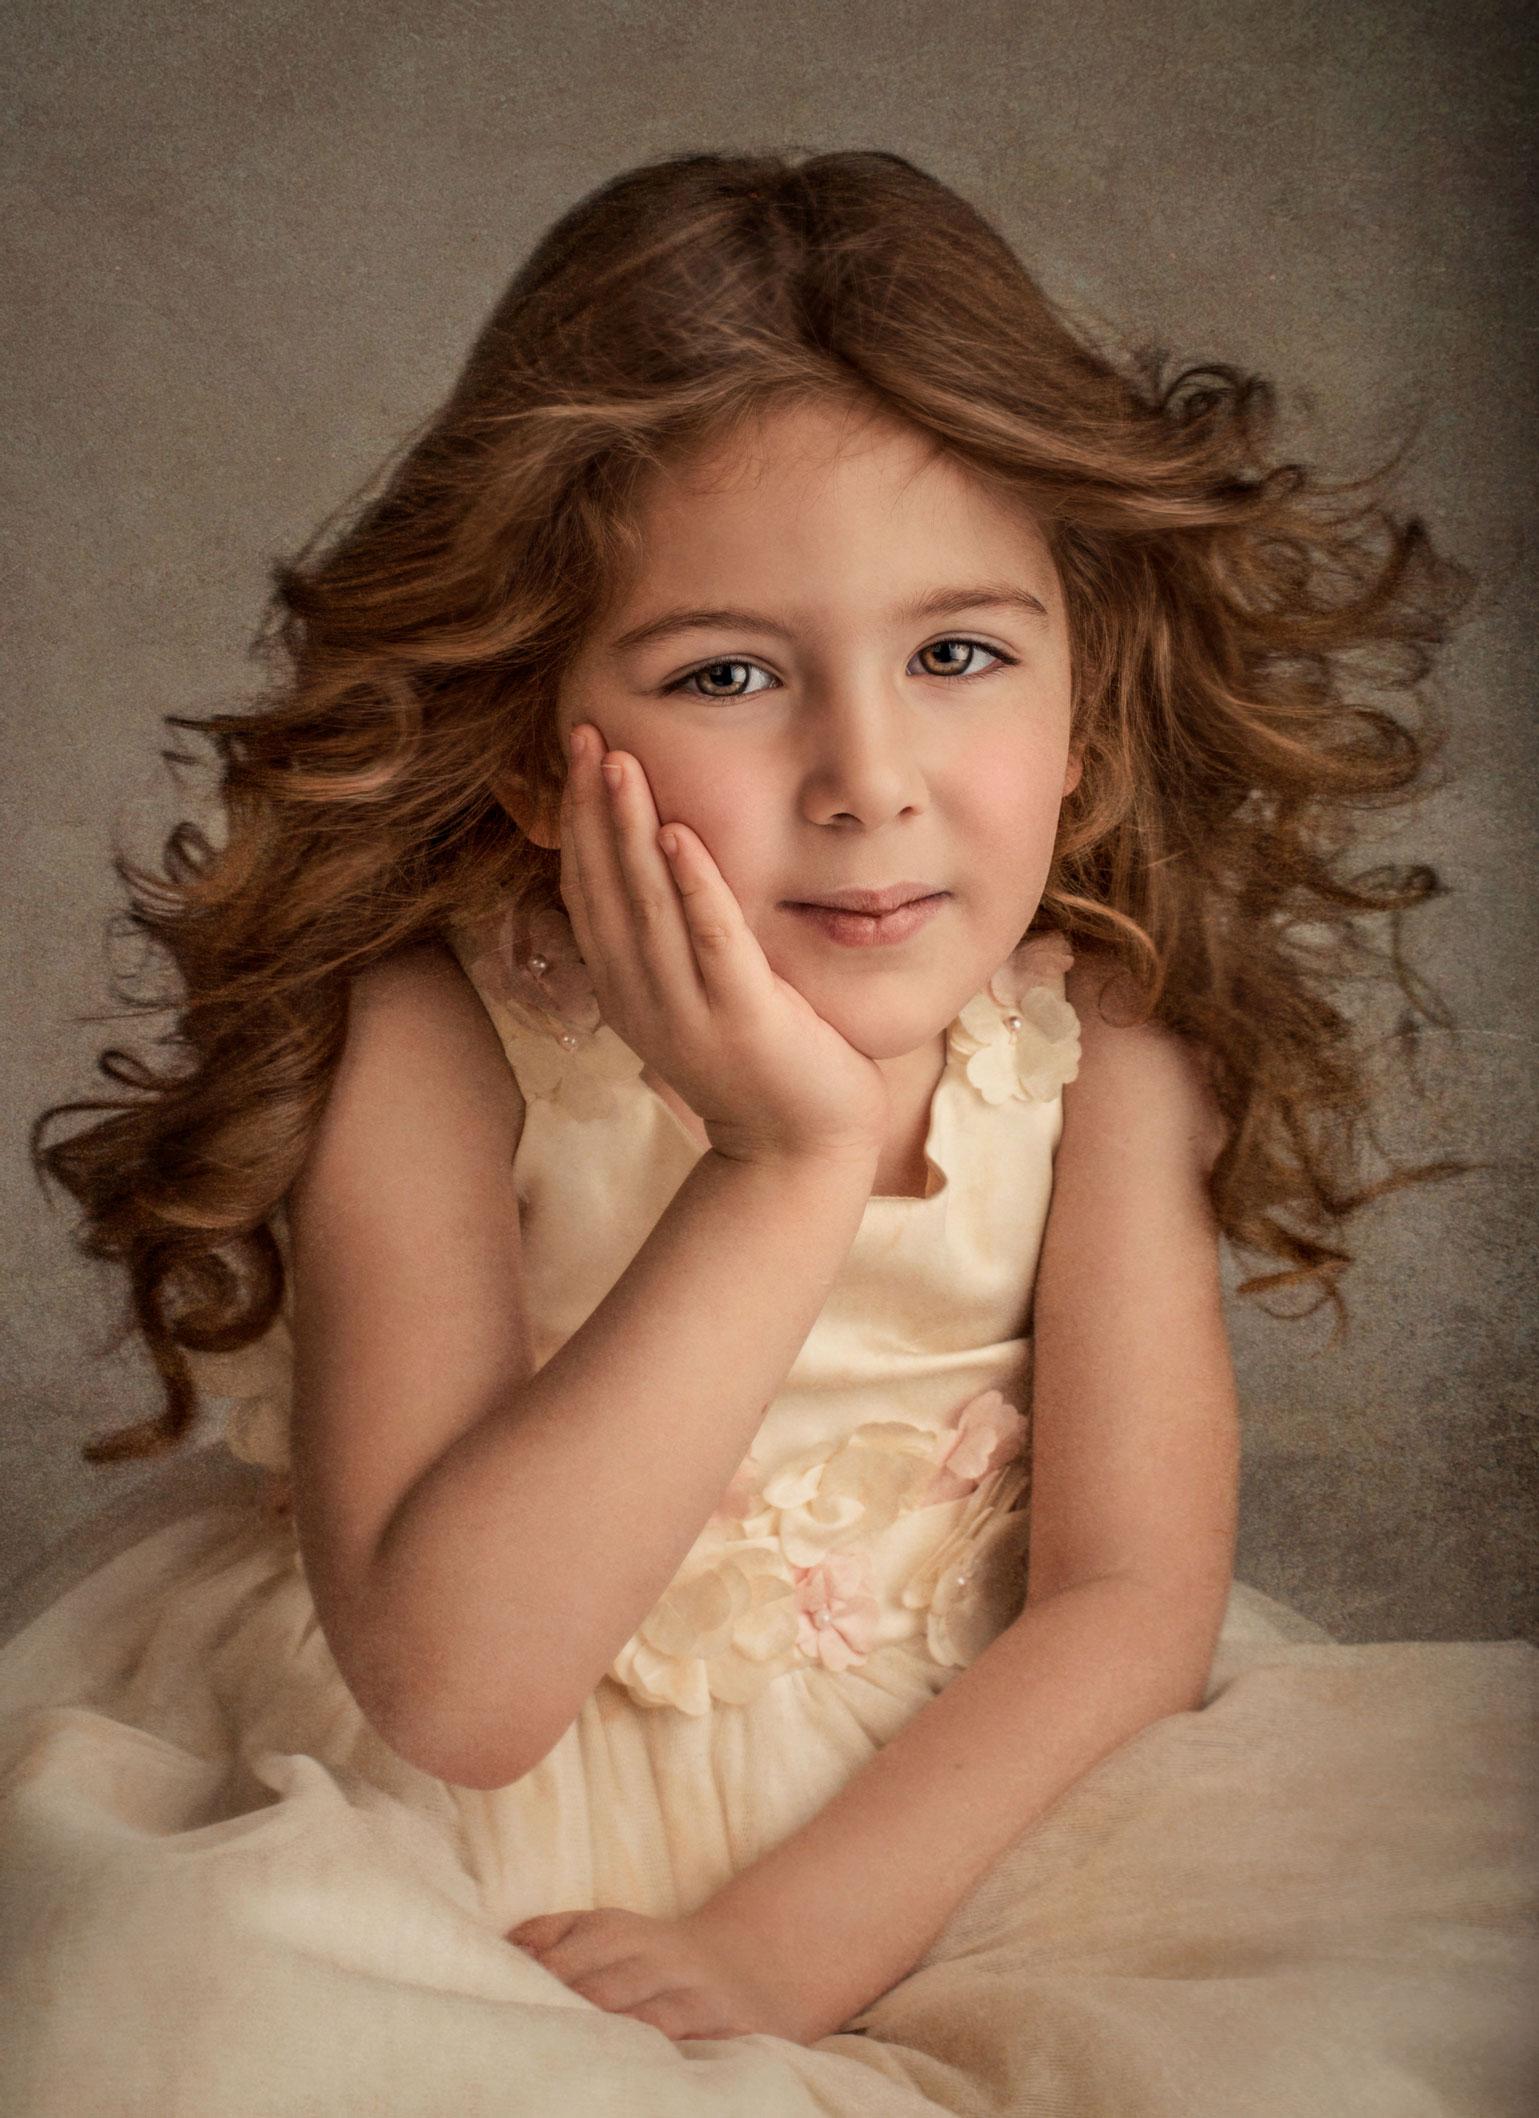 barbara_macferrin_photography_boulder_colorado_80303_fine_art_children_girl_long_hair_dress.jpg